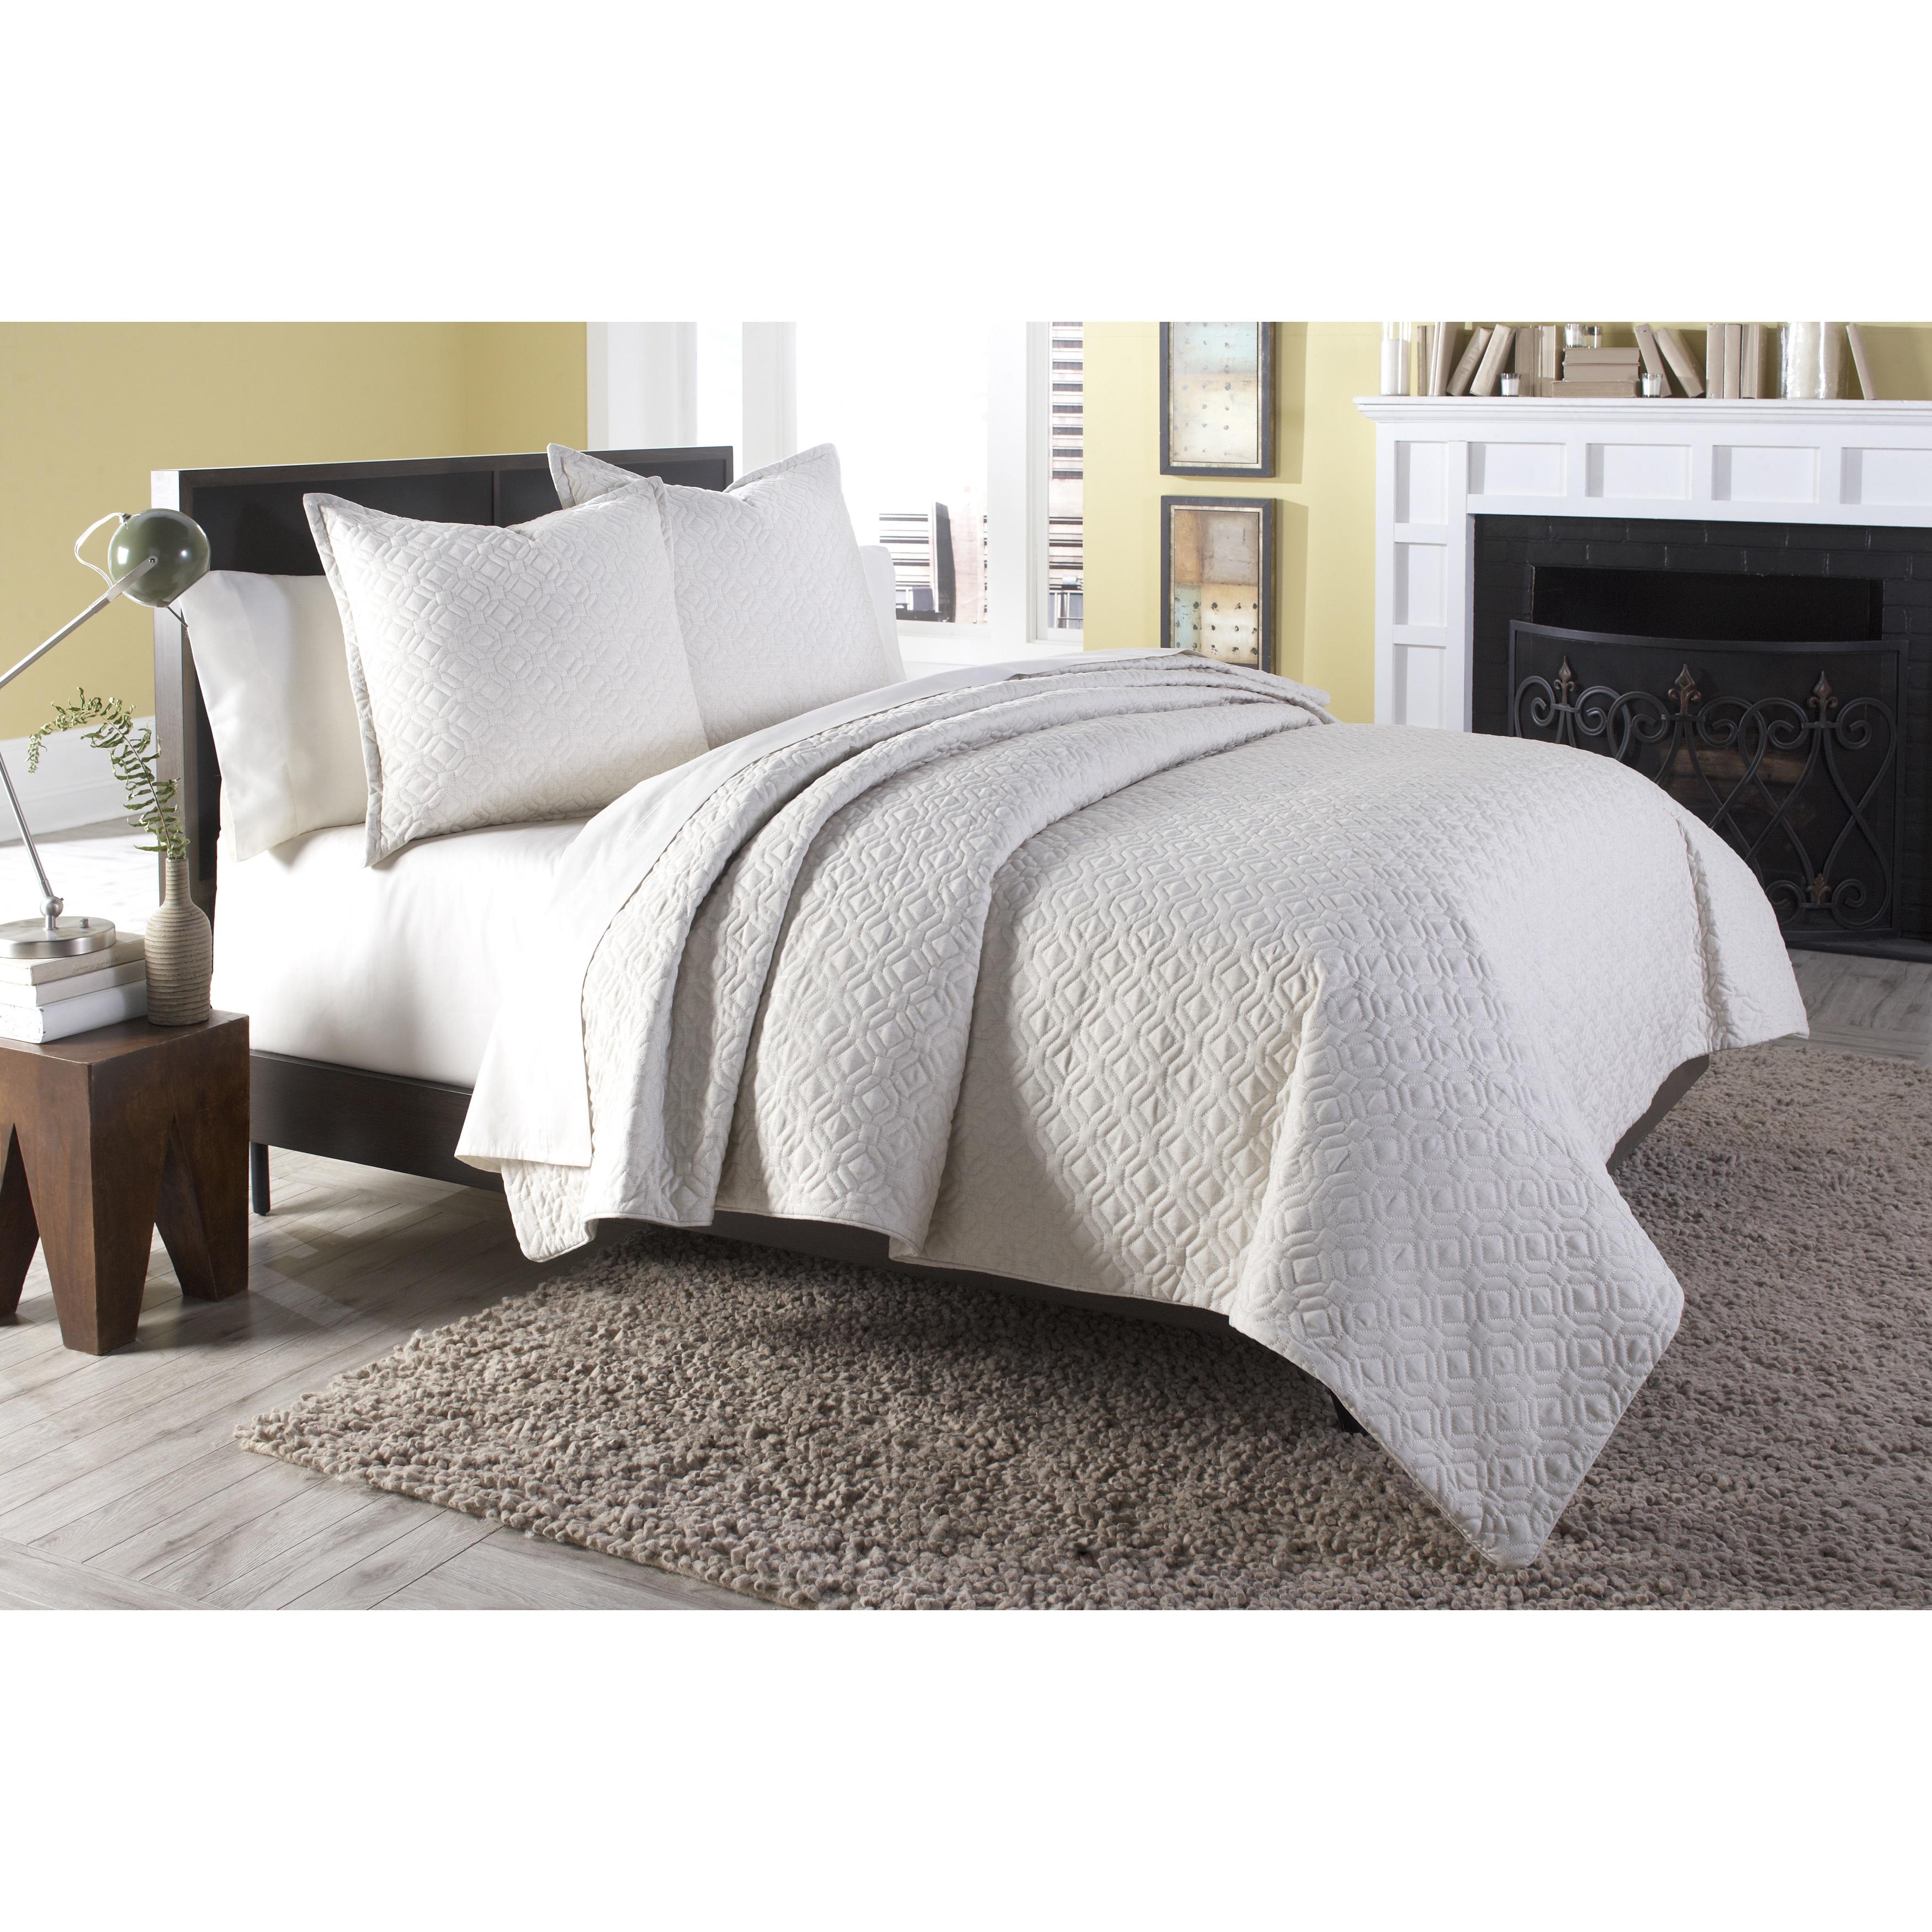 of michael set design aico replacement bedroom and bath amini bed bedding ideas best elegant sets parts